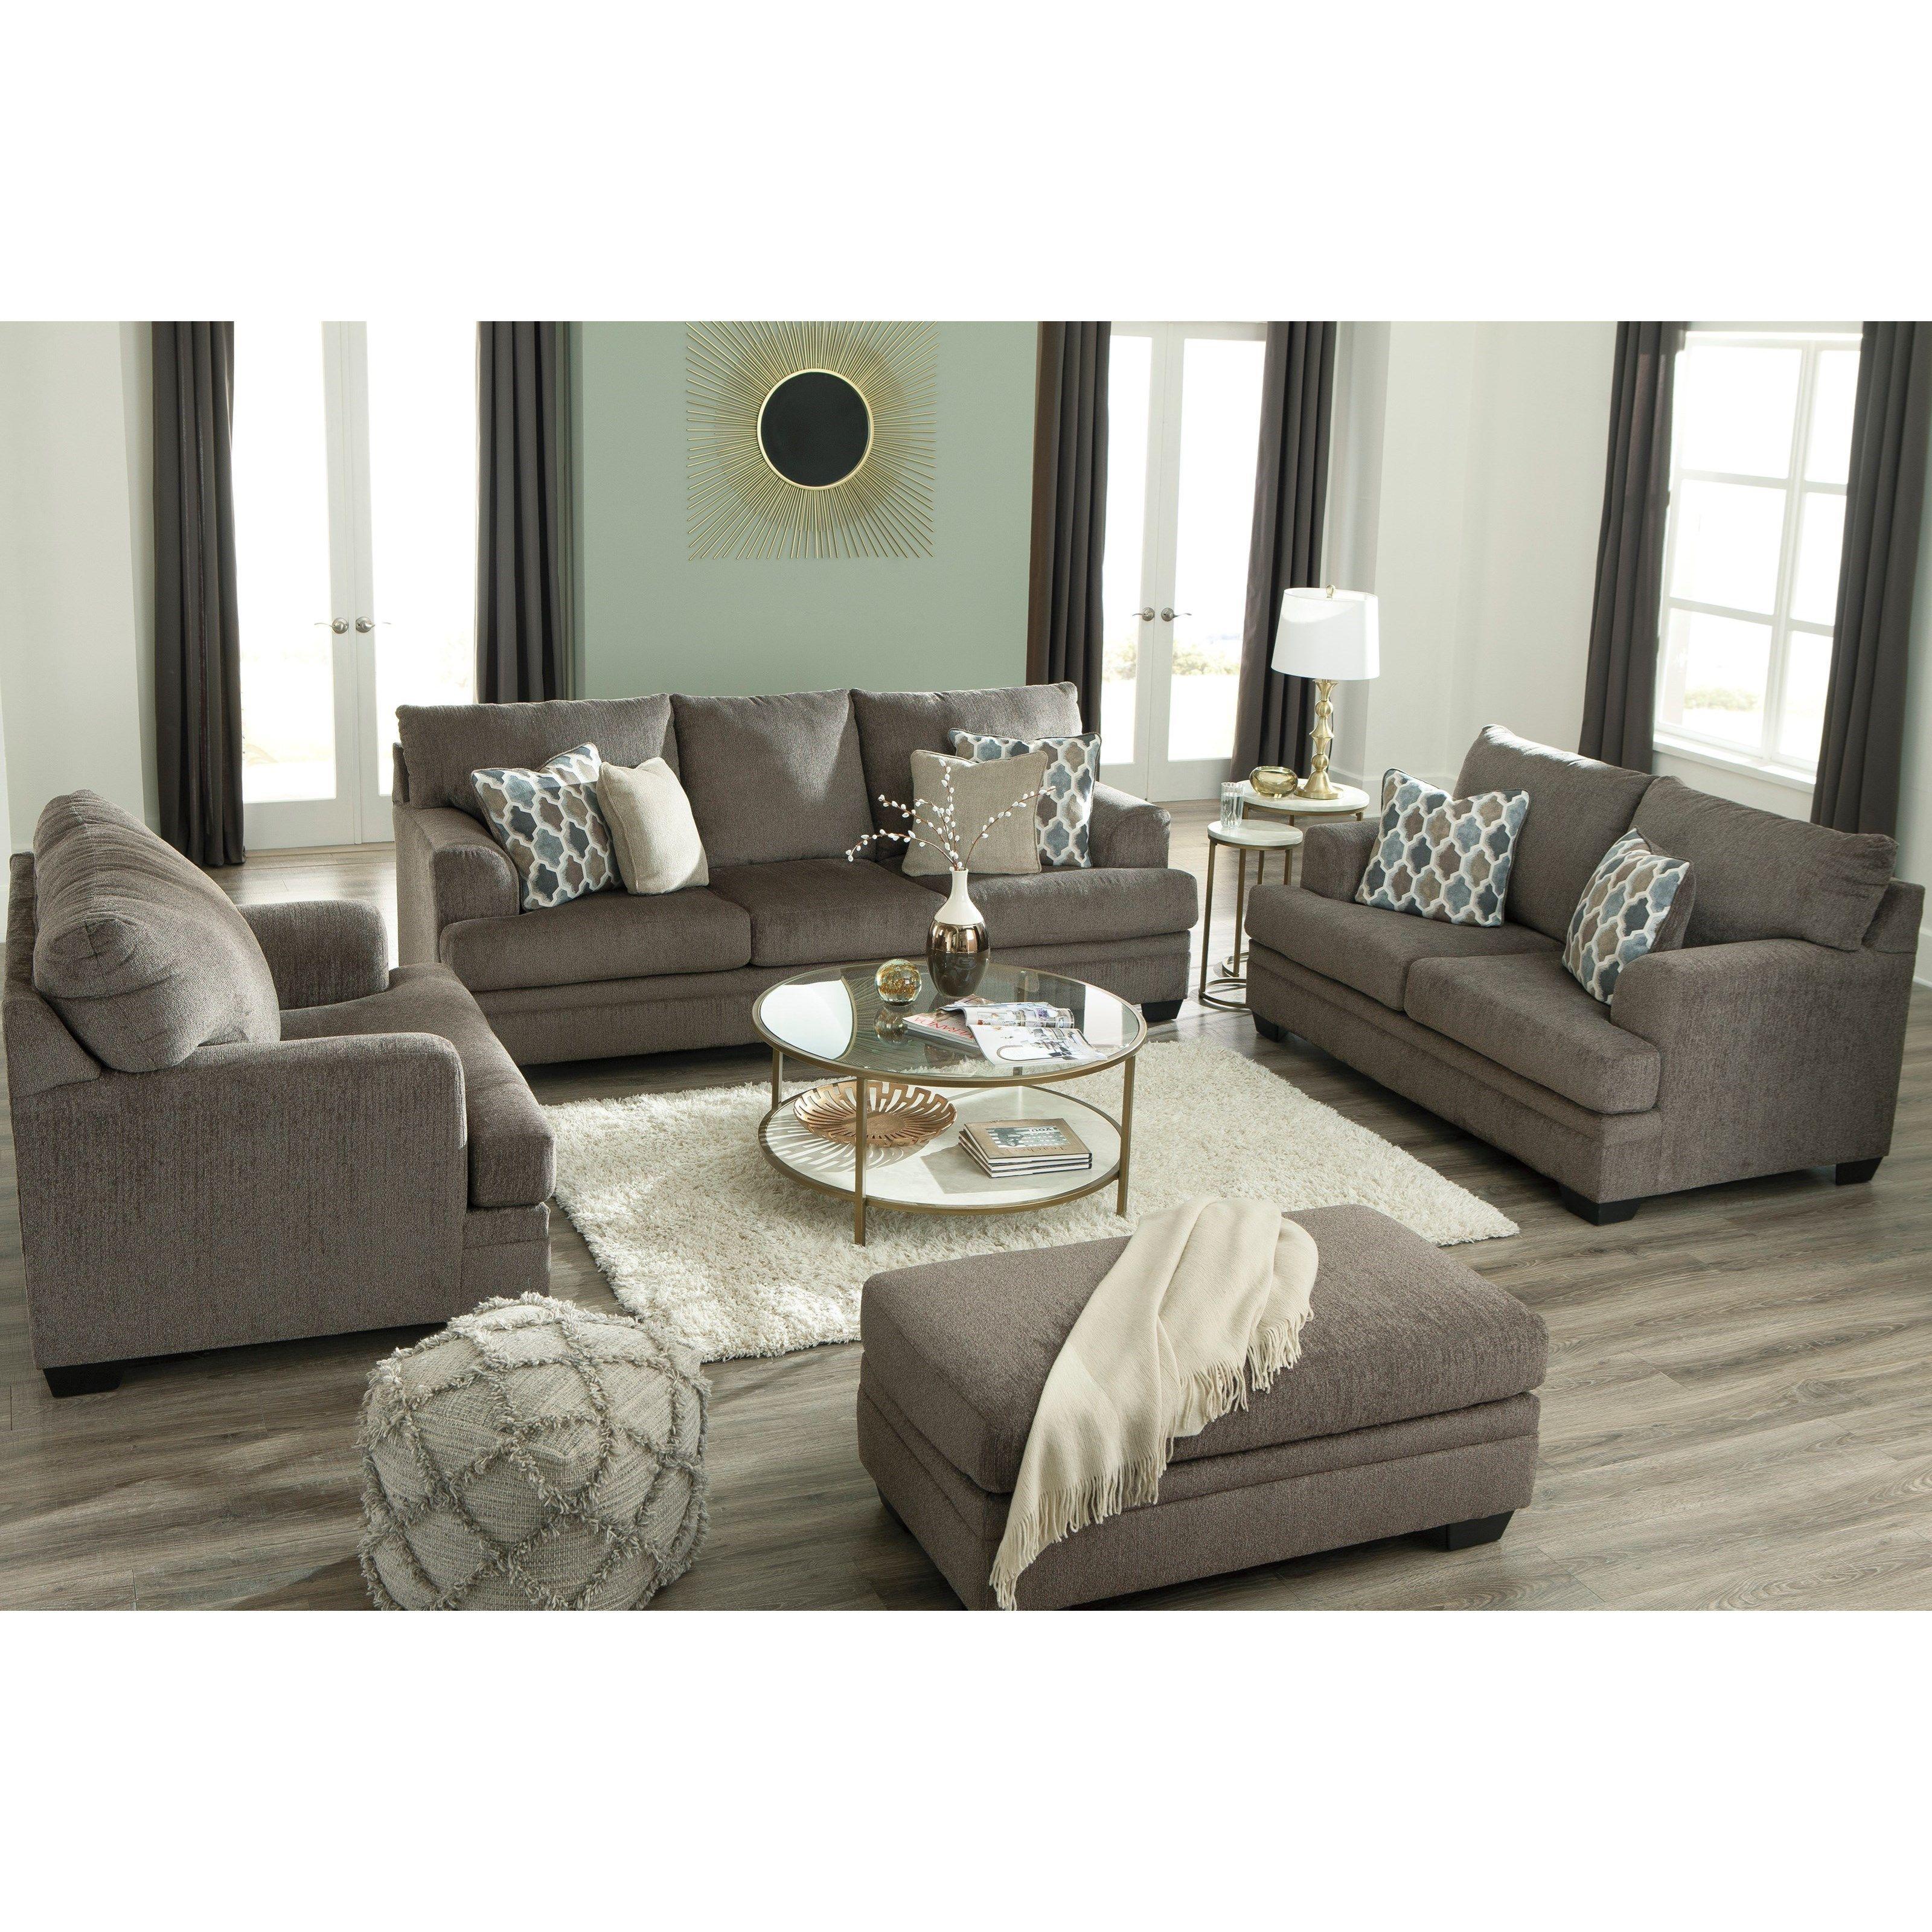 Stationary Living Room Group Living Room Designs Furniture